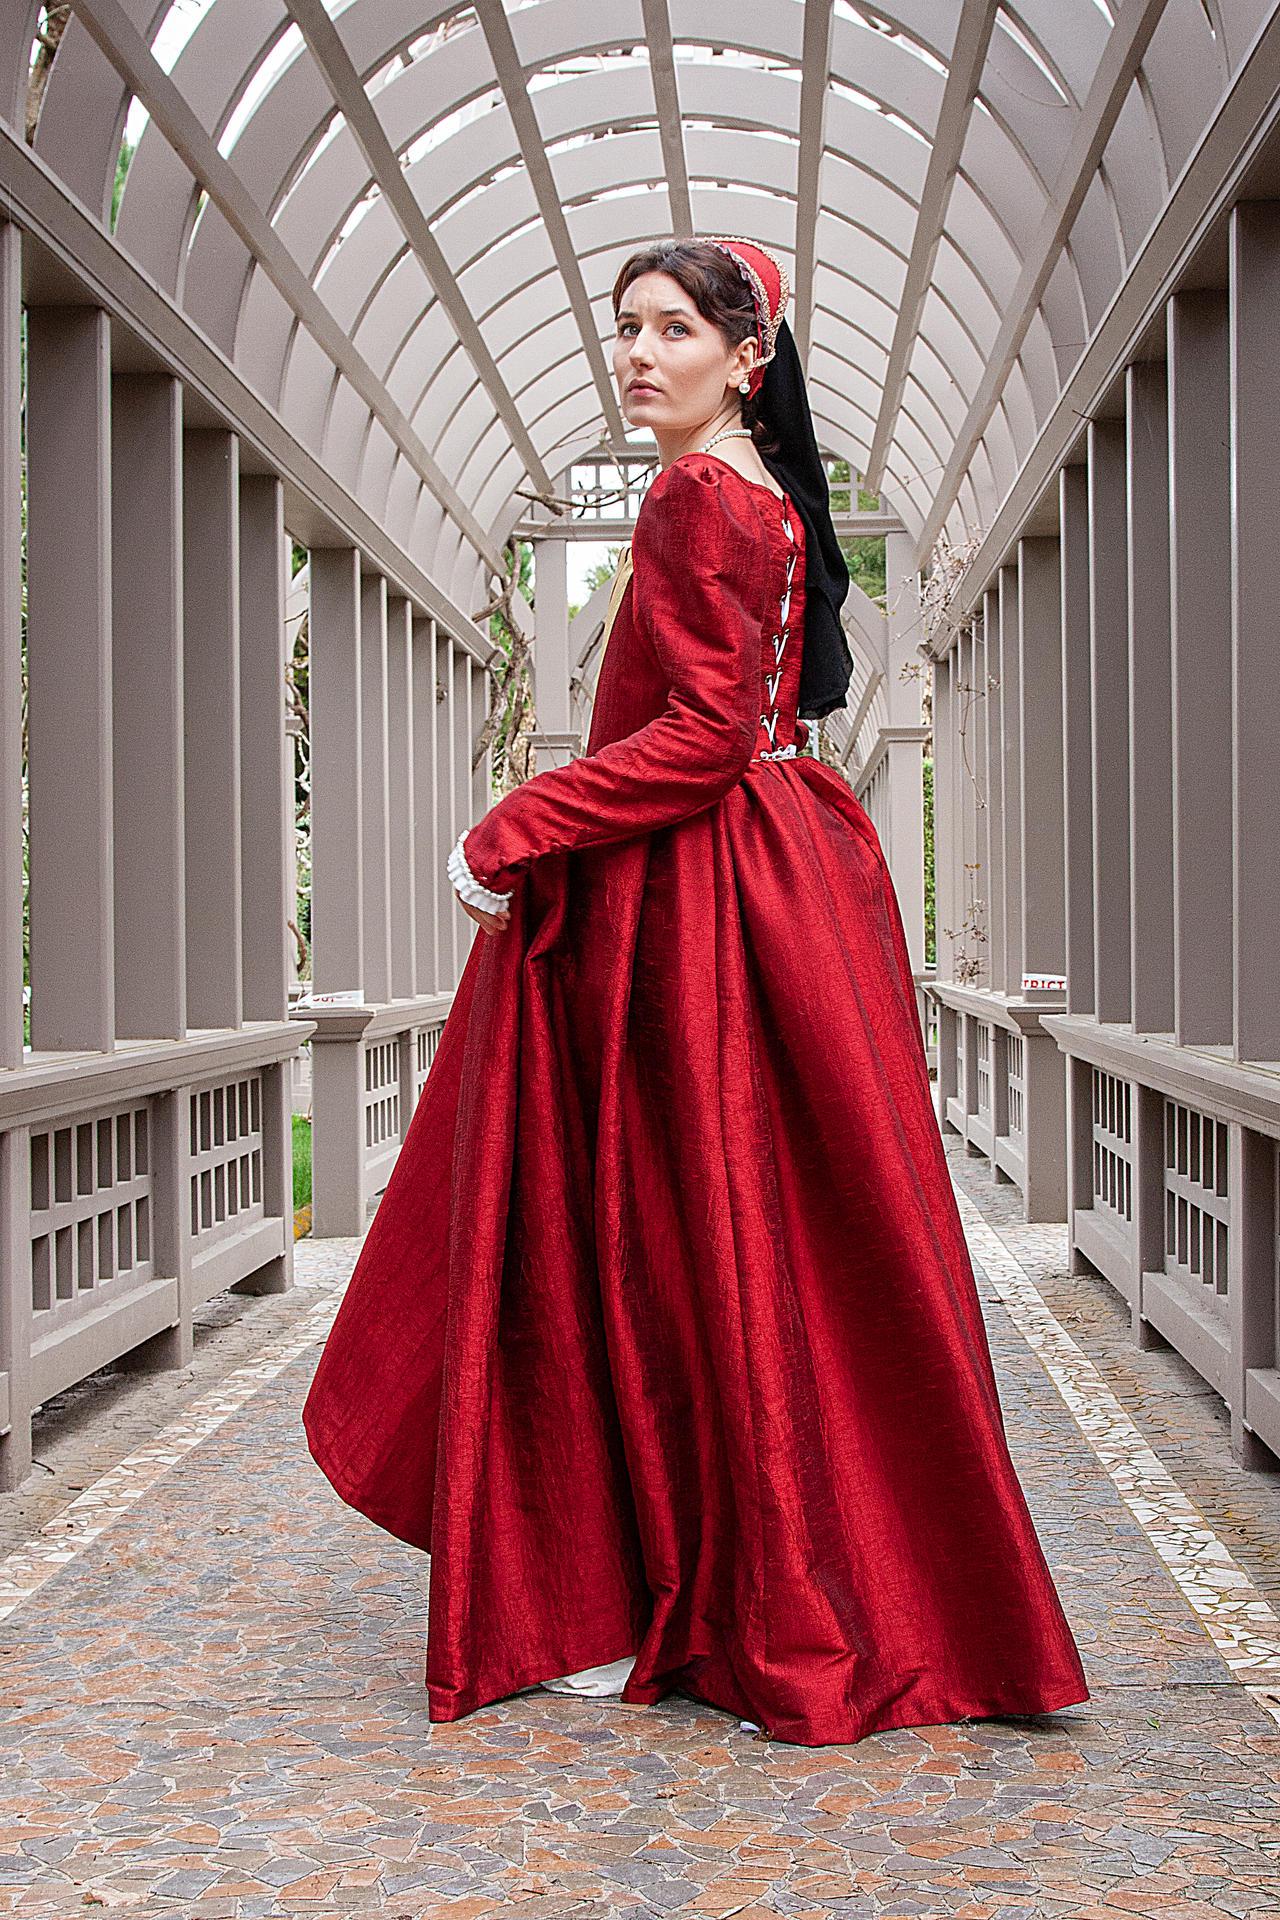 Tudor costume stock 2